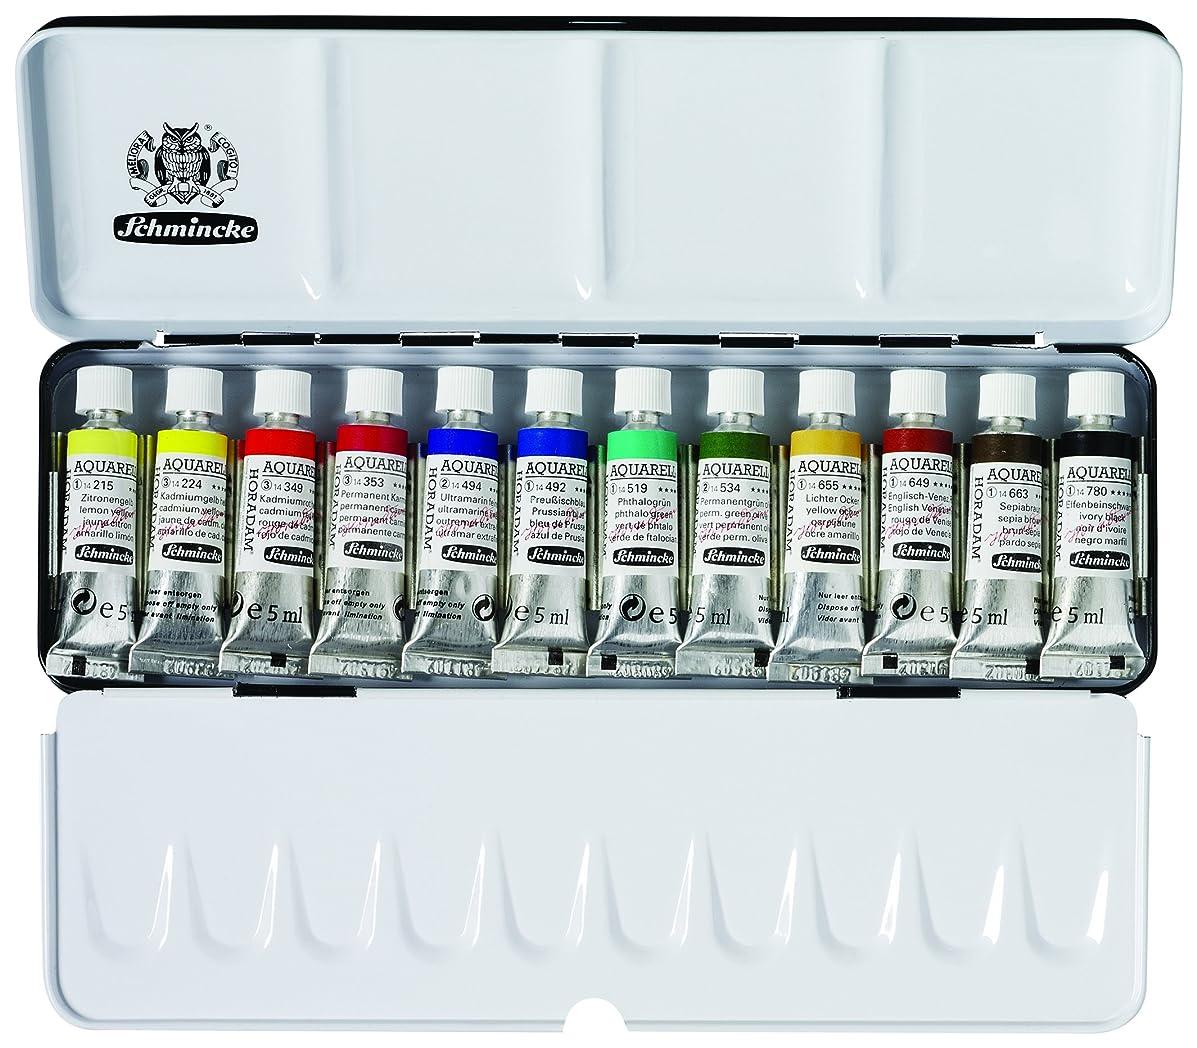 Schmincke Horadam Aquarell 5ml Paint Tube Metal Set, Set of 12 Colors (74112097)